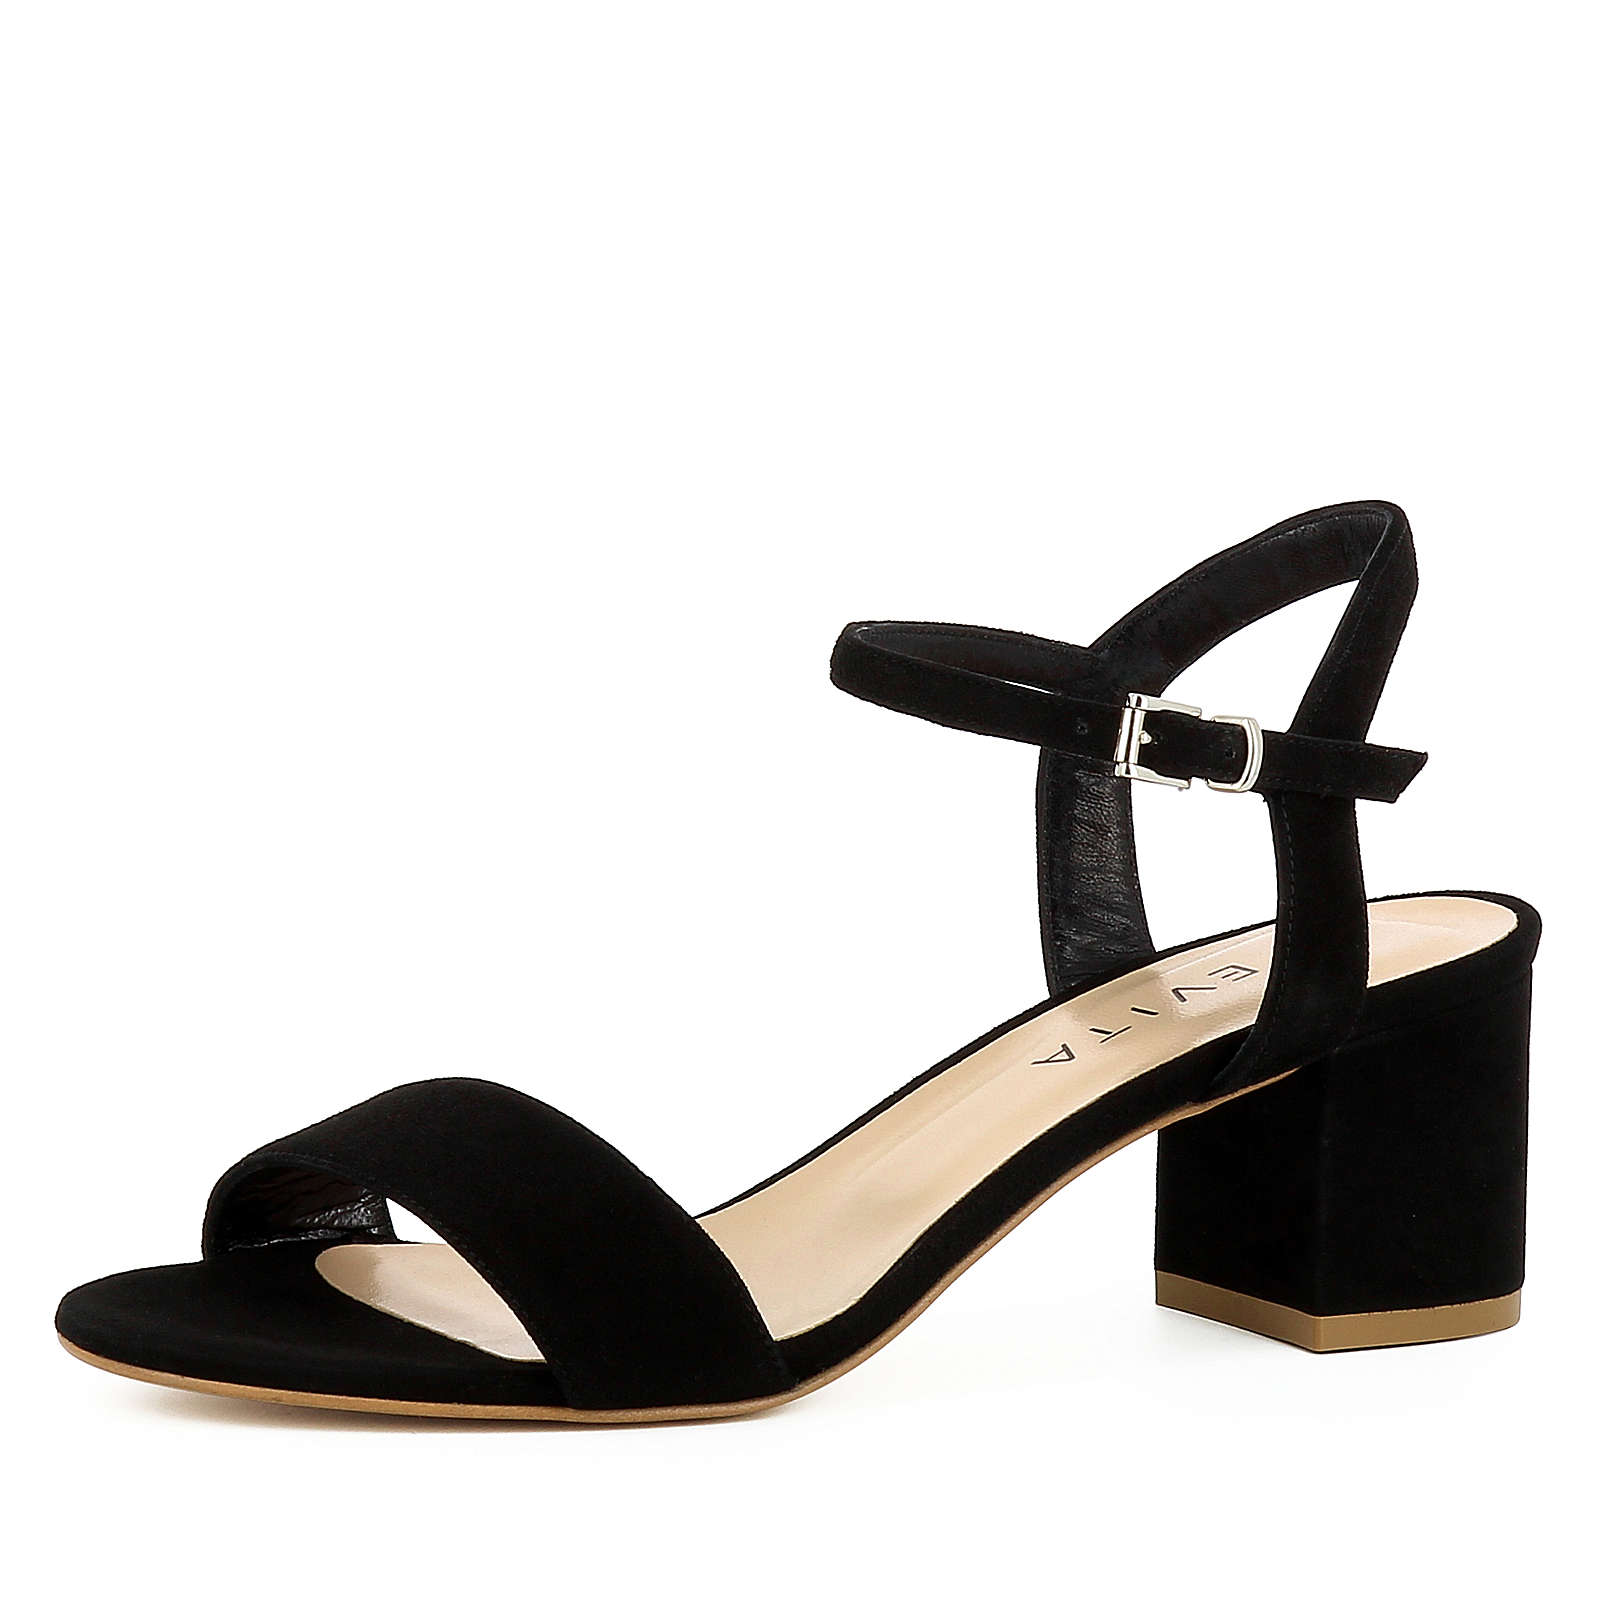 Evita Shoes MARIELLA Klassische Sandaletten schwarz Damen Gr. 37